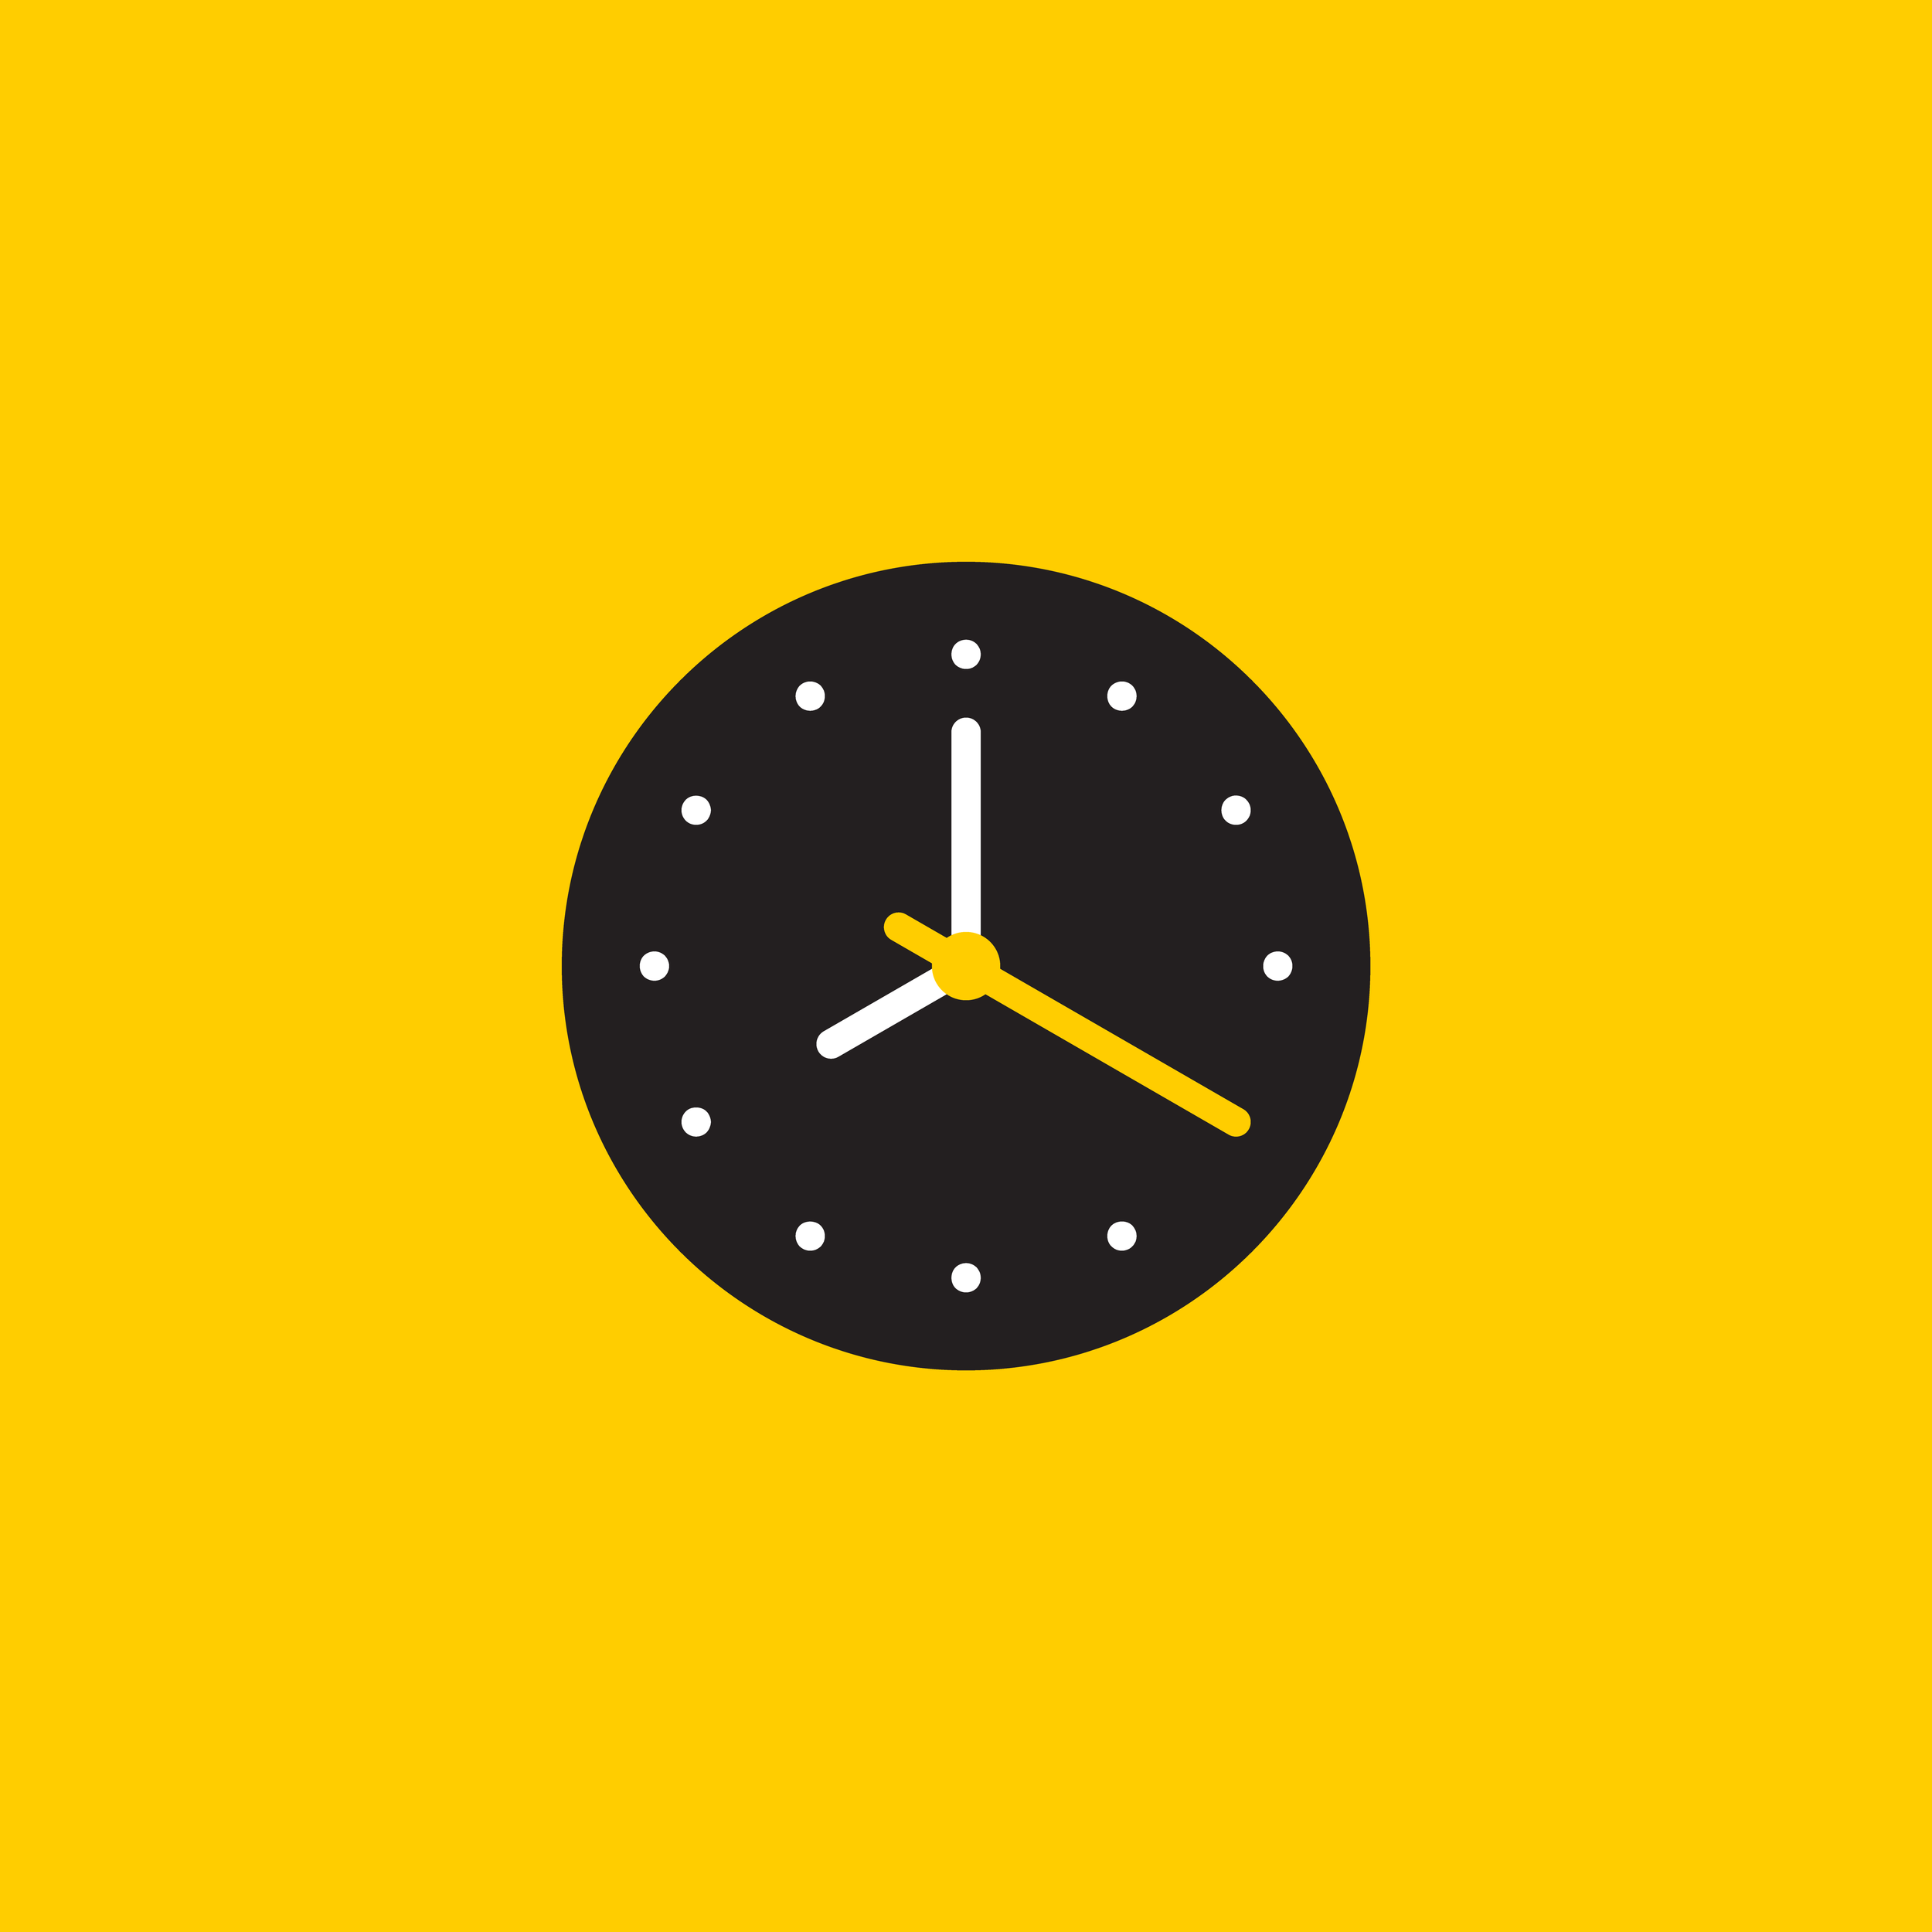 Clock_RGB_Digital.png